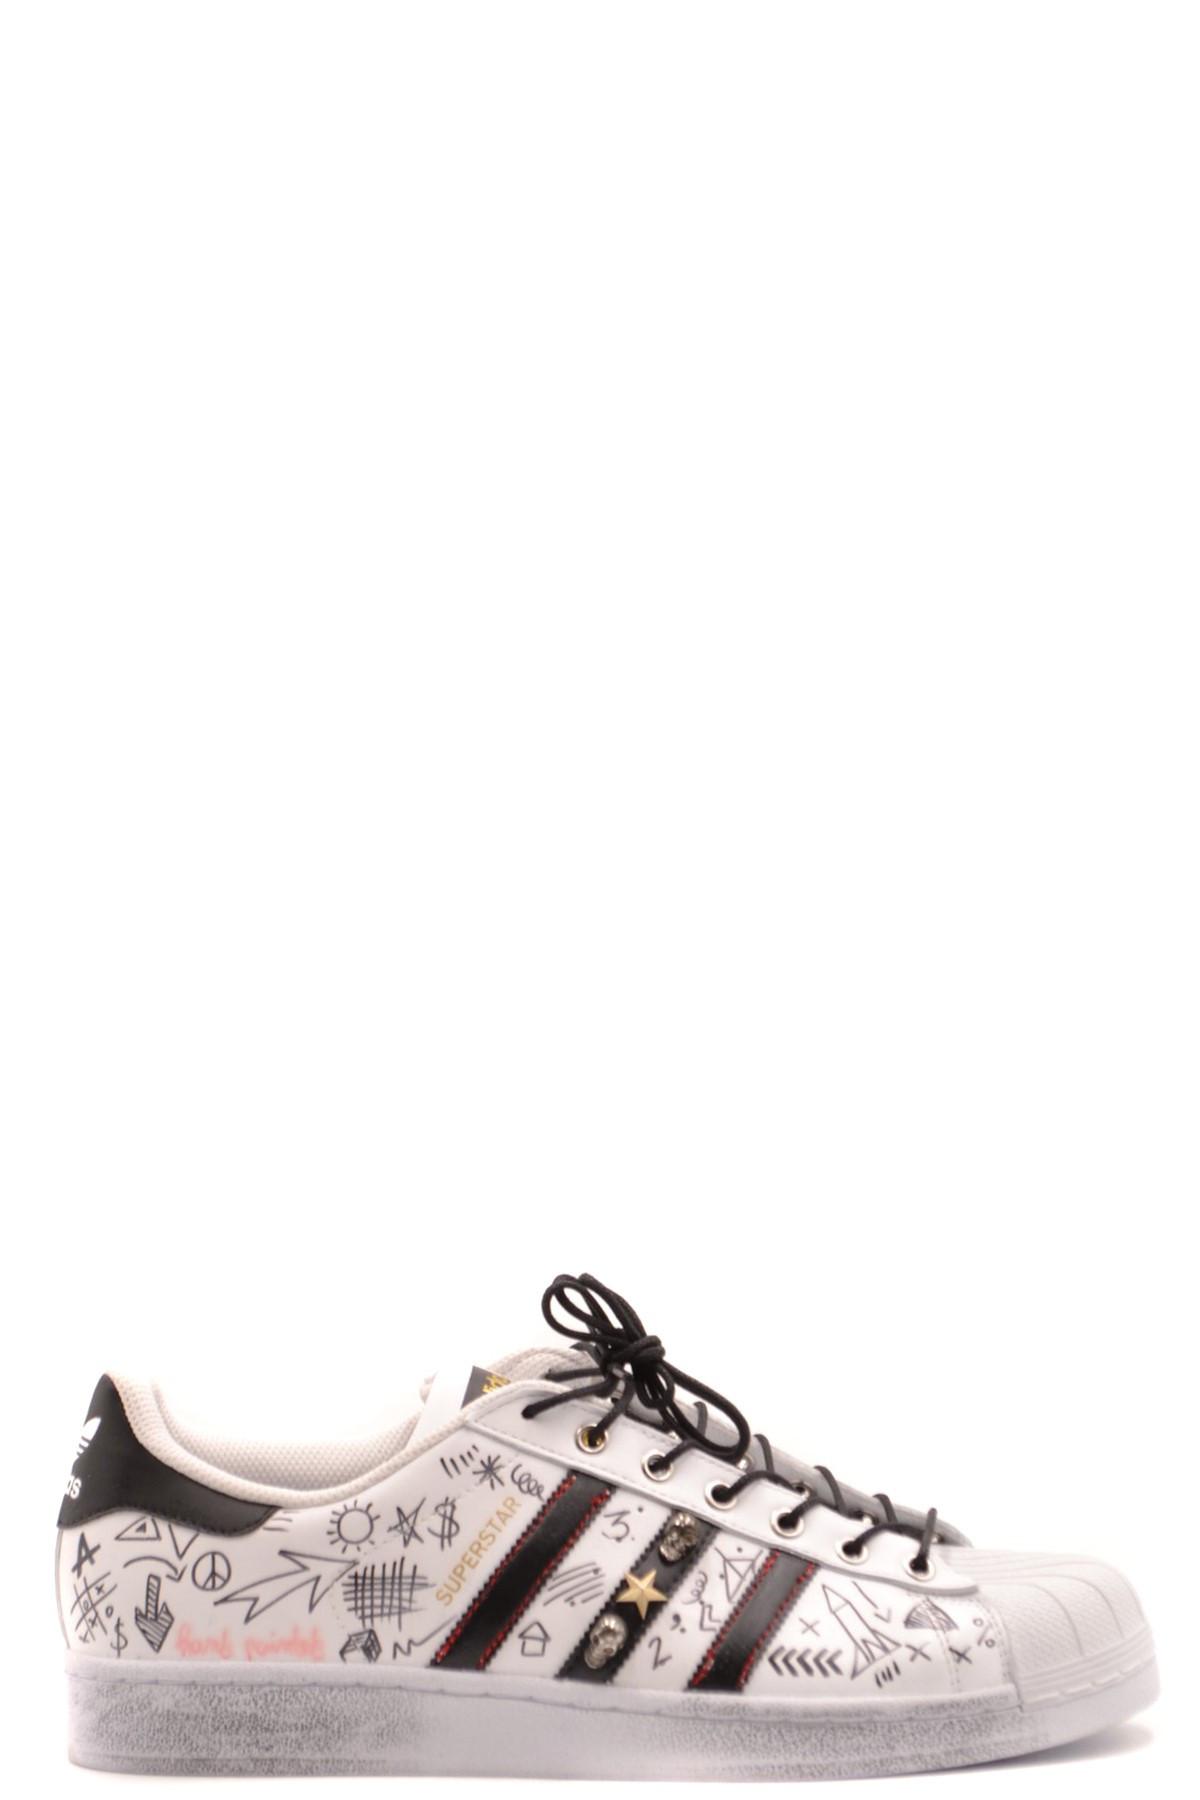 adidasMarchio: Adidas; Genere: Uomo; Tipologia: Sneaker…